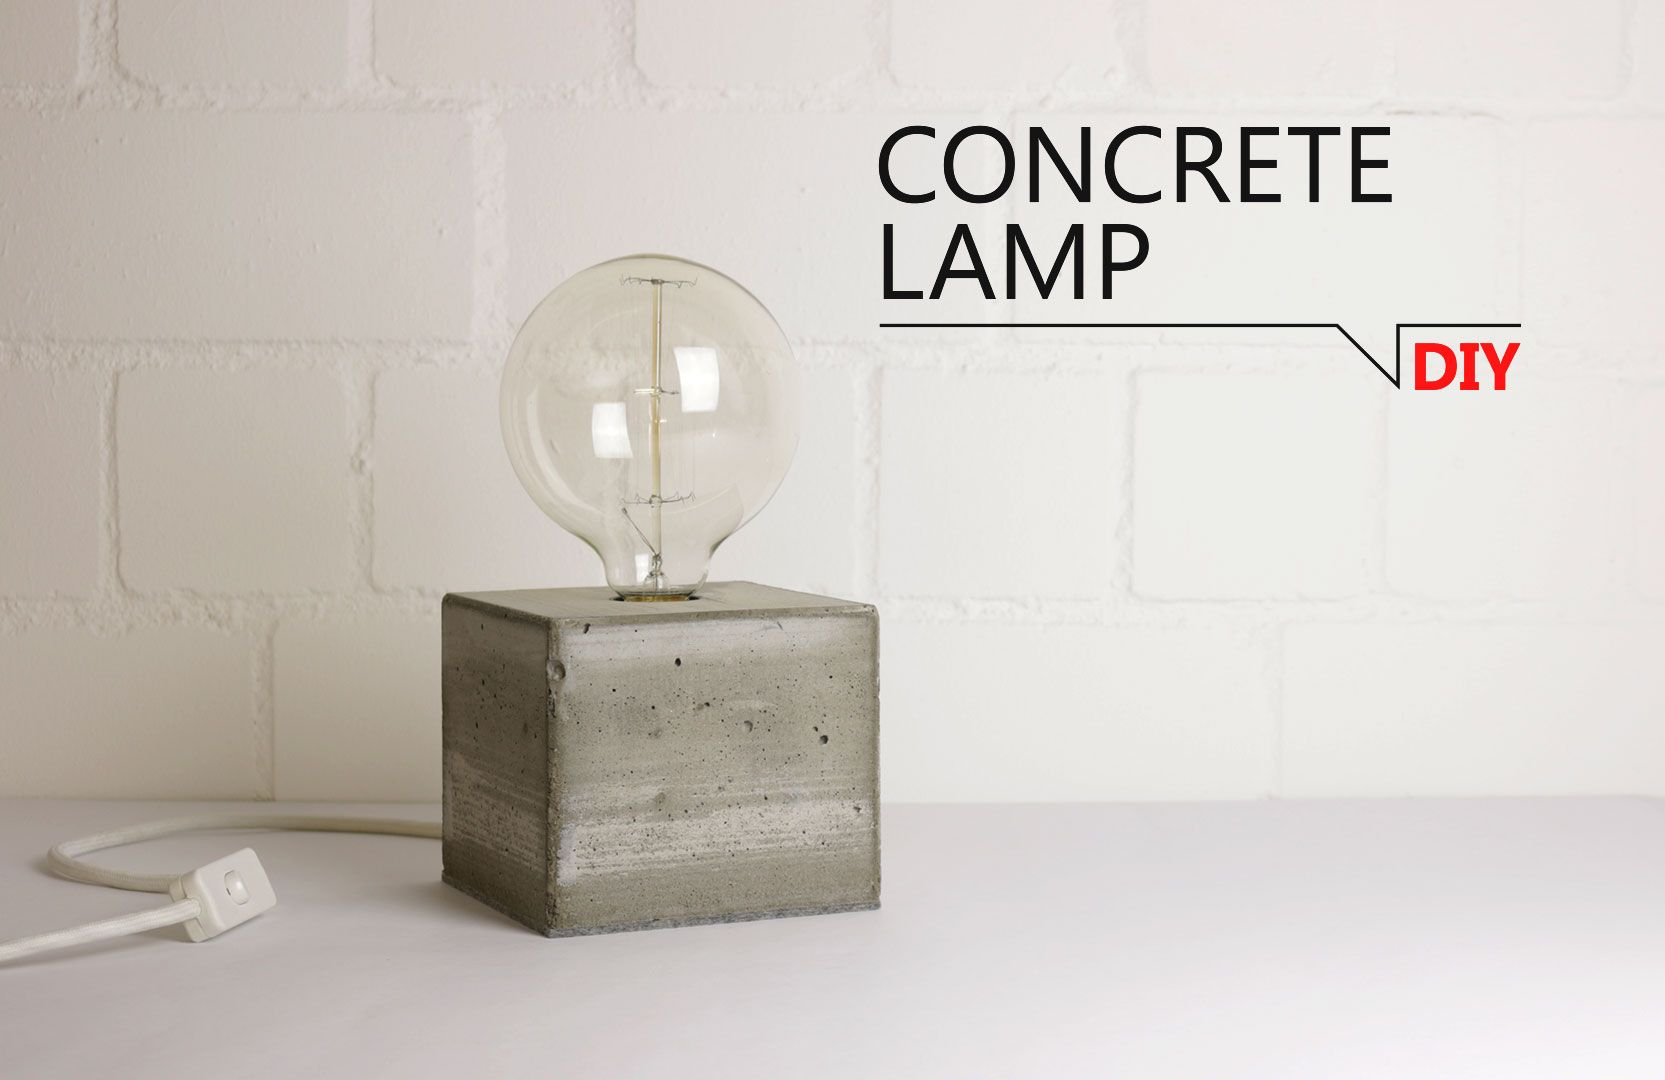 Lampada In Cemento Fai Da Te : Diy concrete lamp video tutorial fai da te fai